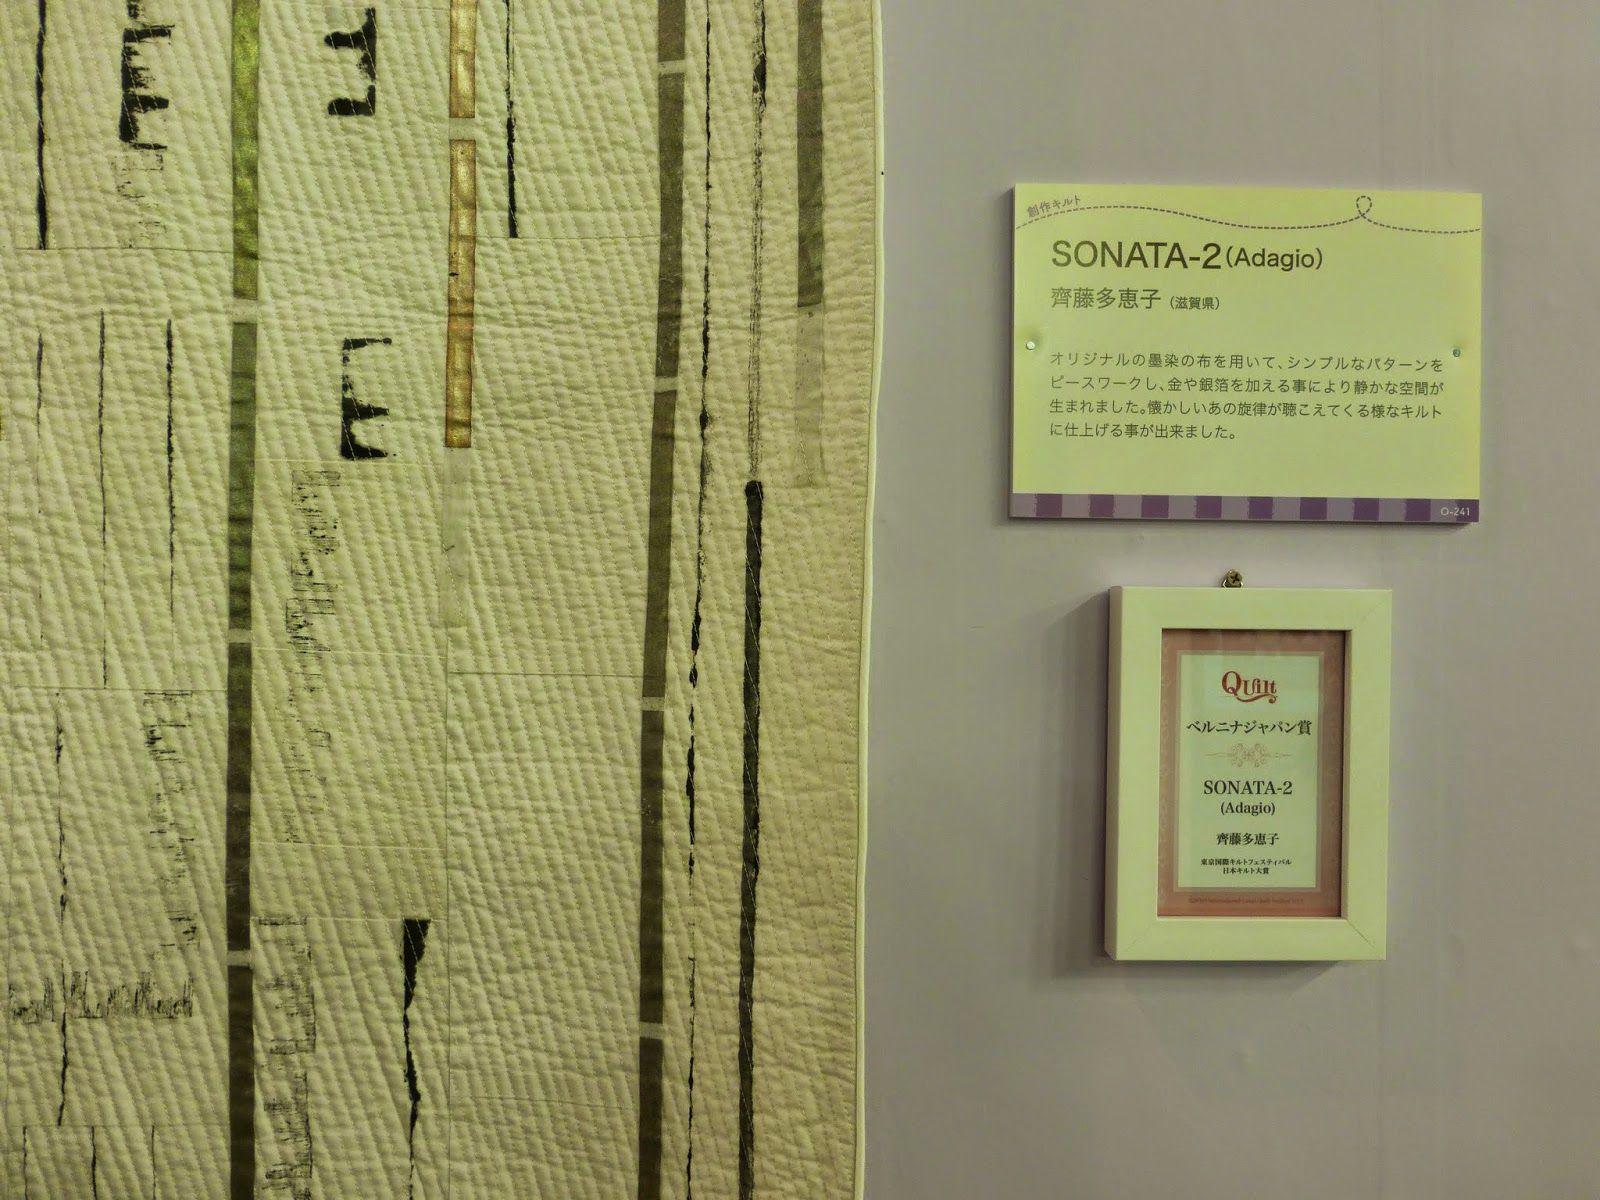 Sashiko And Other Stitching Tokyo International Great